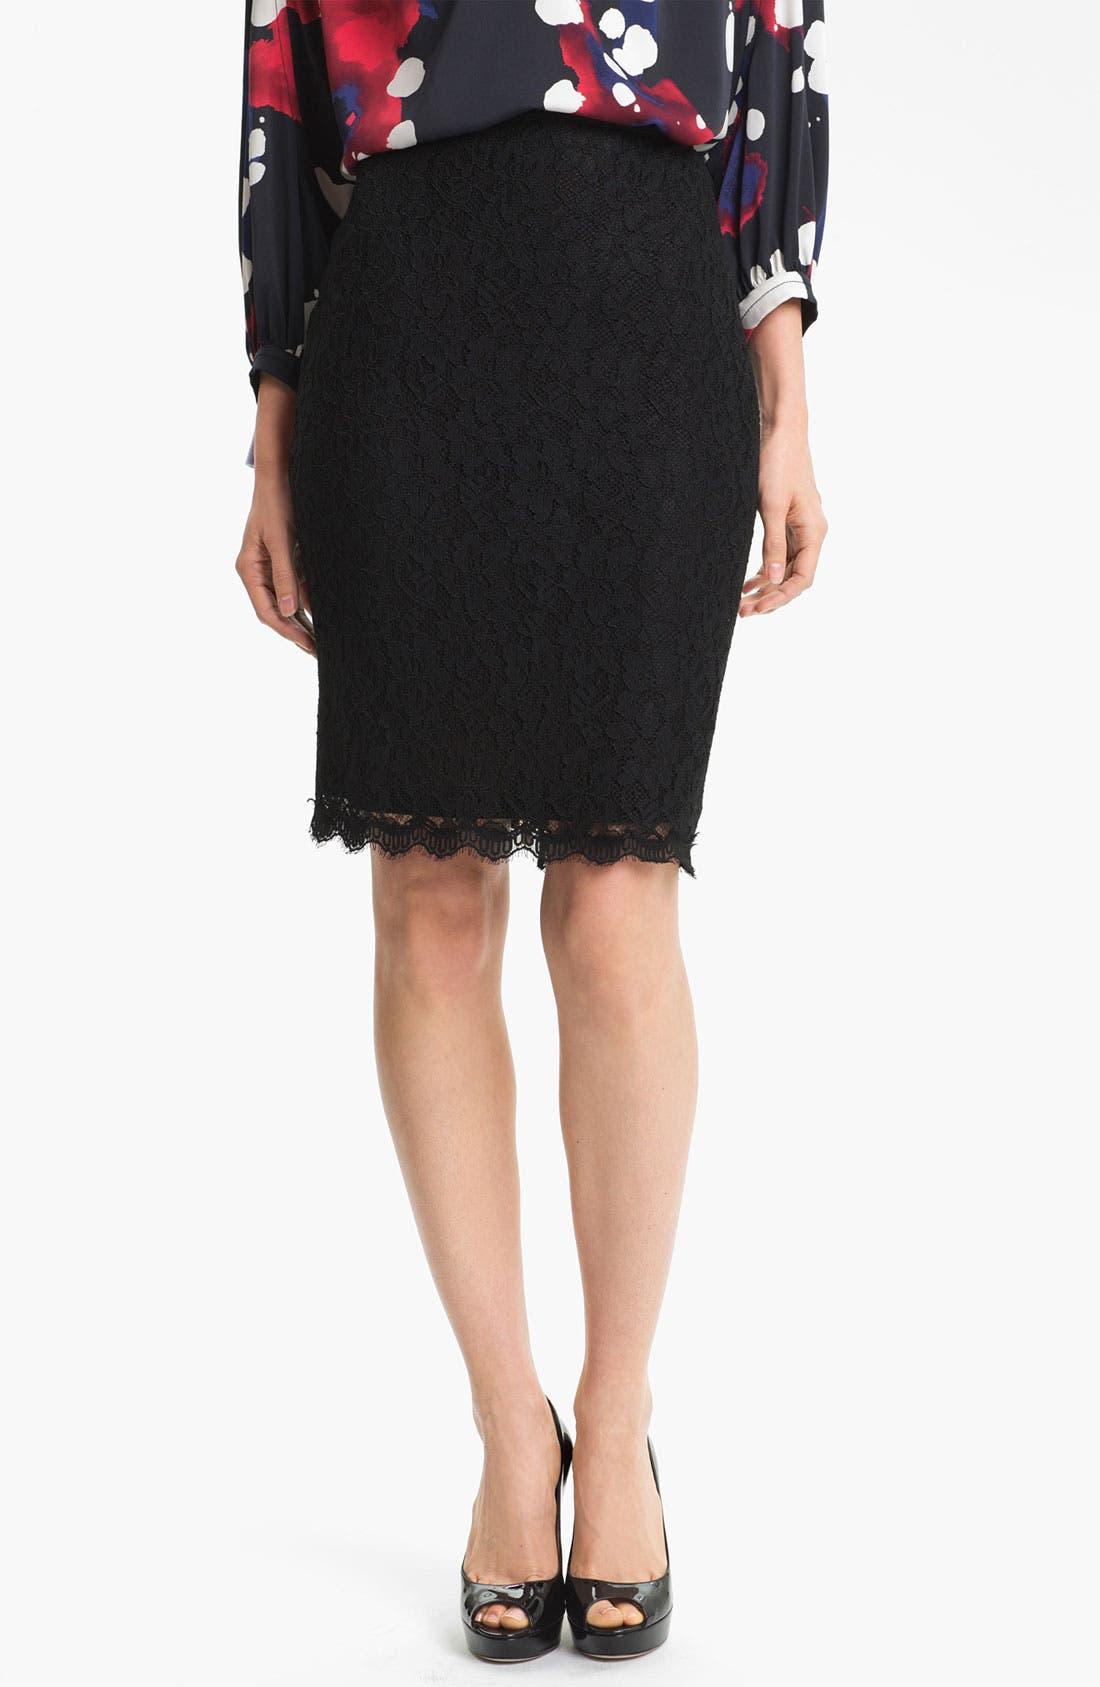 Alternate Image 1 Selected - Diane von Furstenberg 'Scotia' Lace Skirt